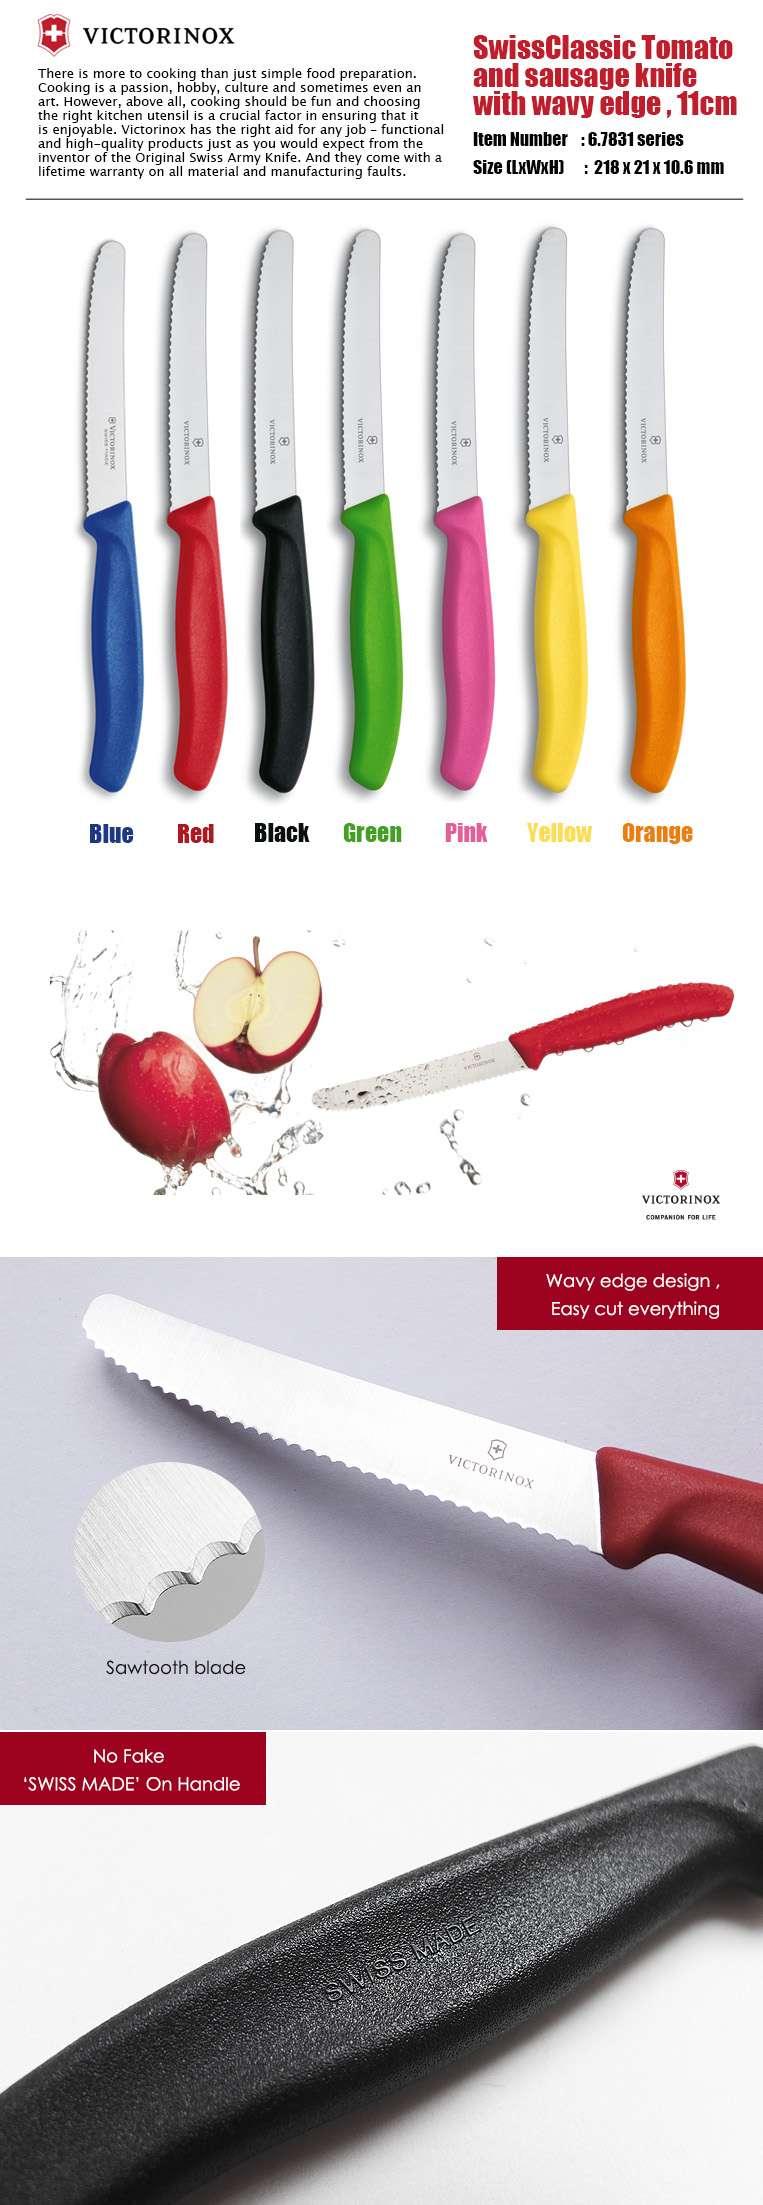 Victorinox Swiss Color Series Classic Tomato Sausage Knife Wavy Edge ...